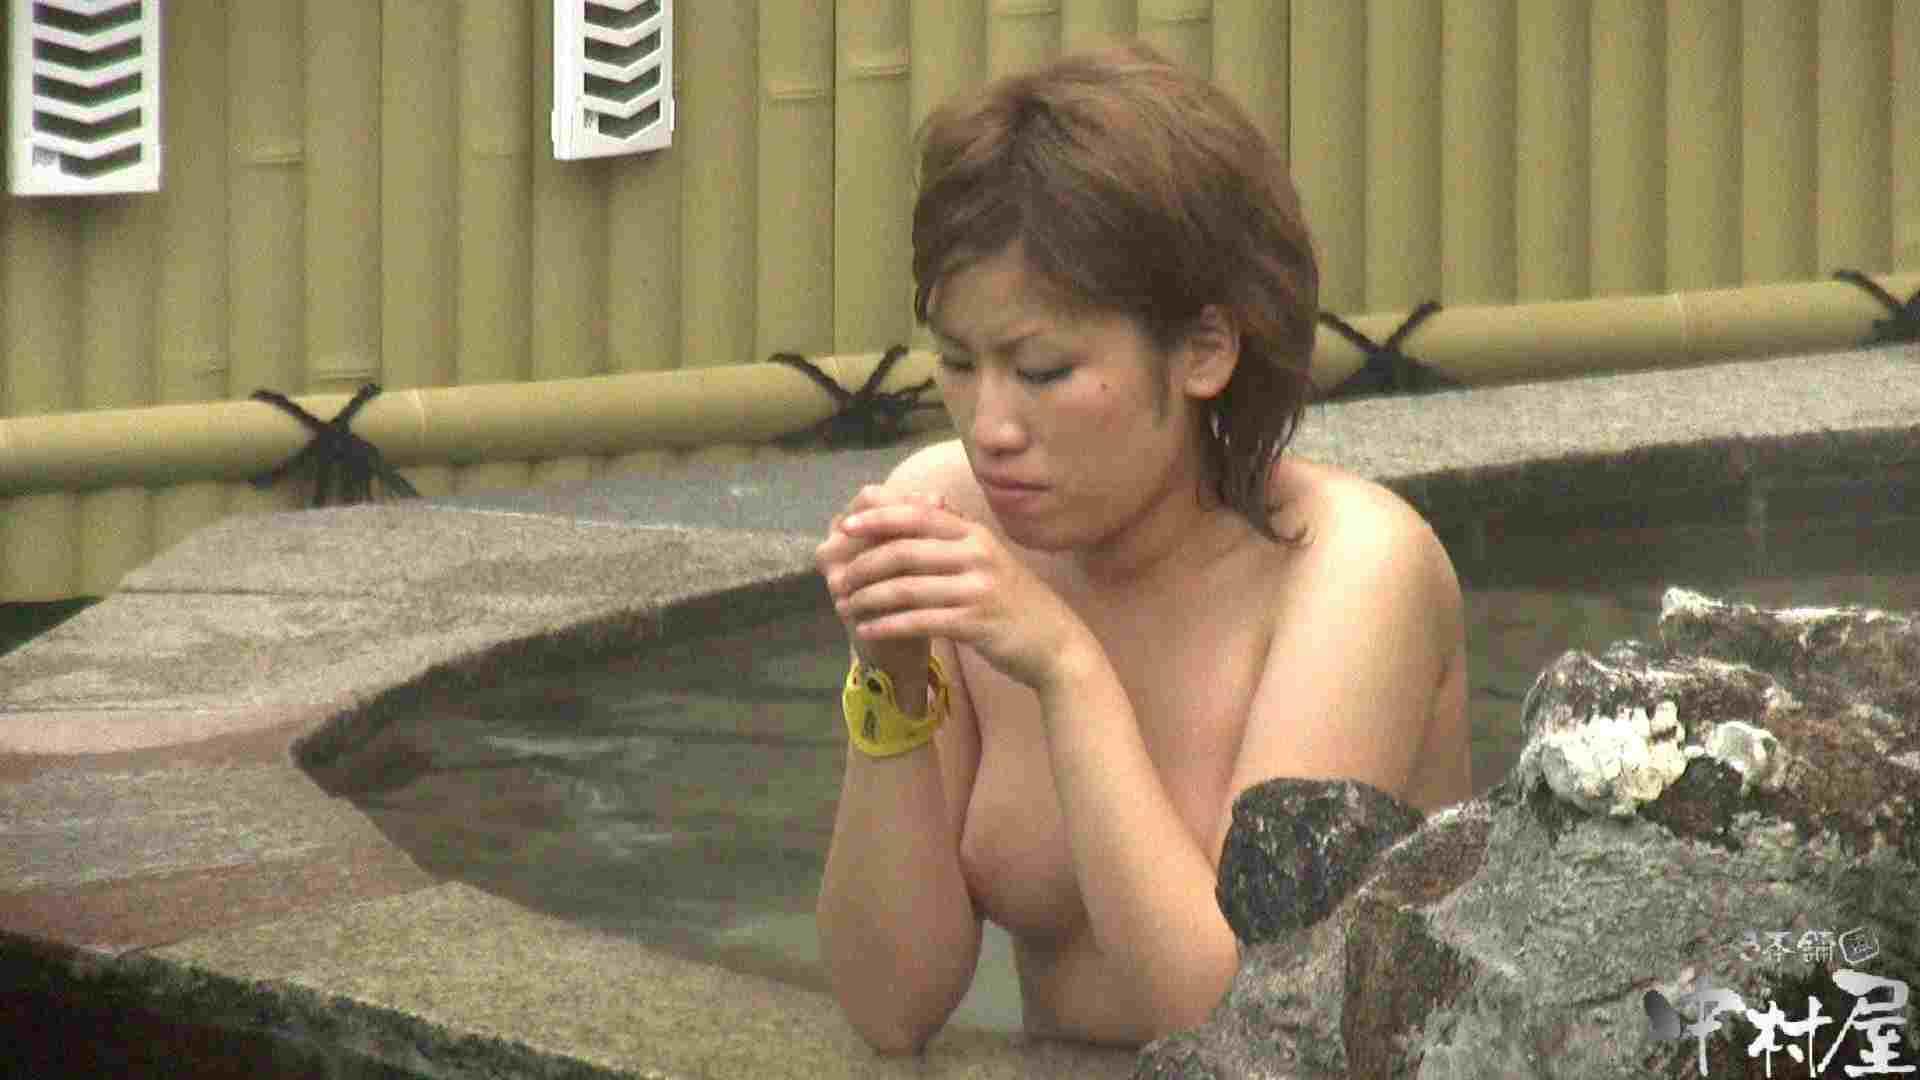 Aquaな露天風呂Vol.918 0 | 0  55連発 29